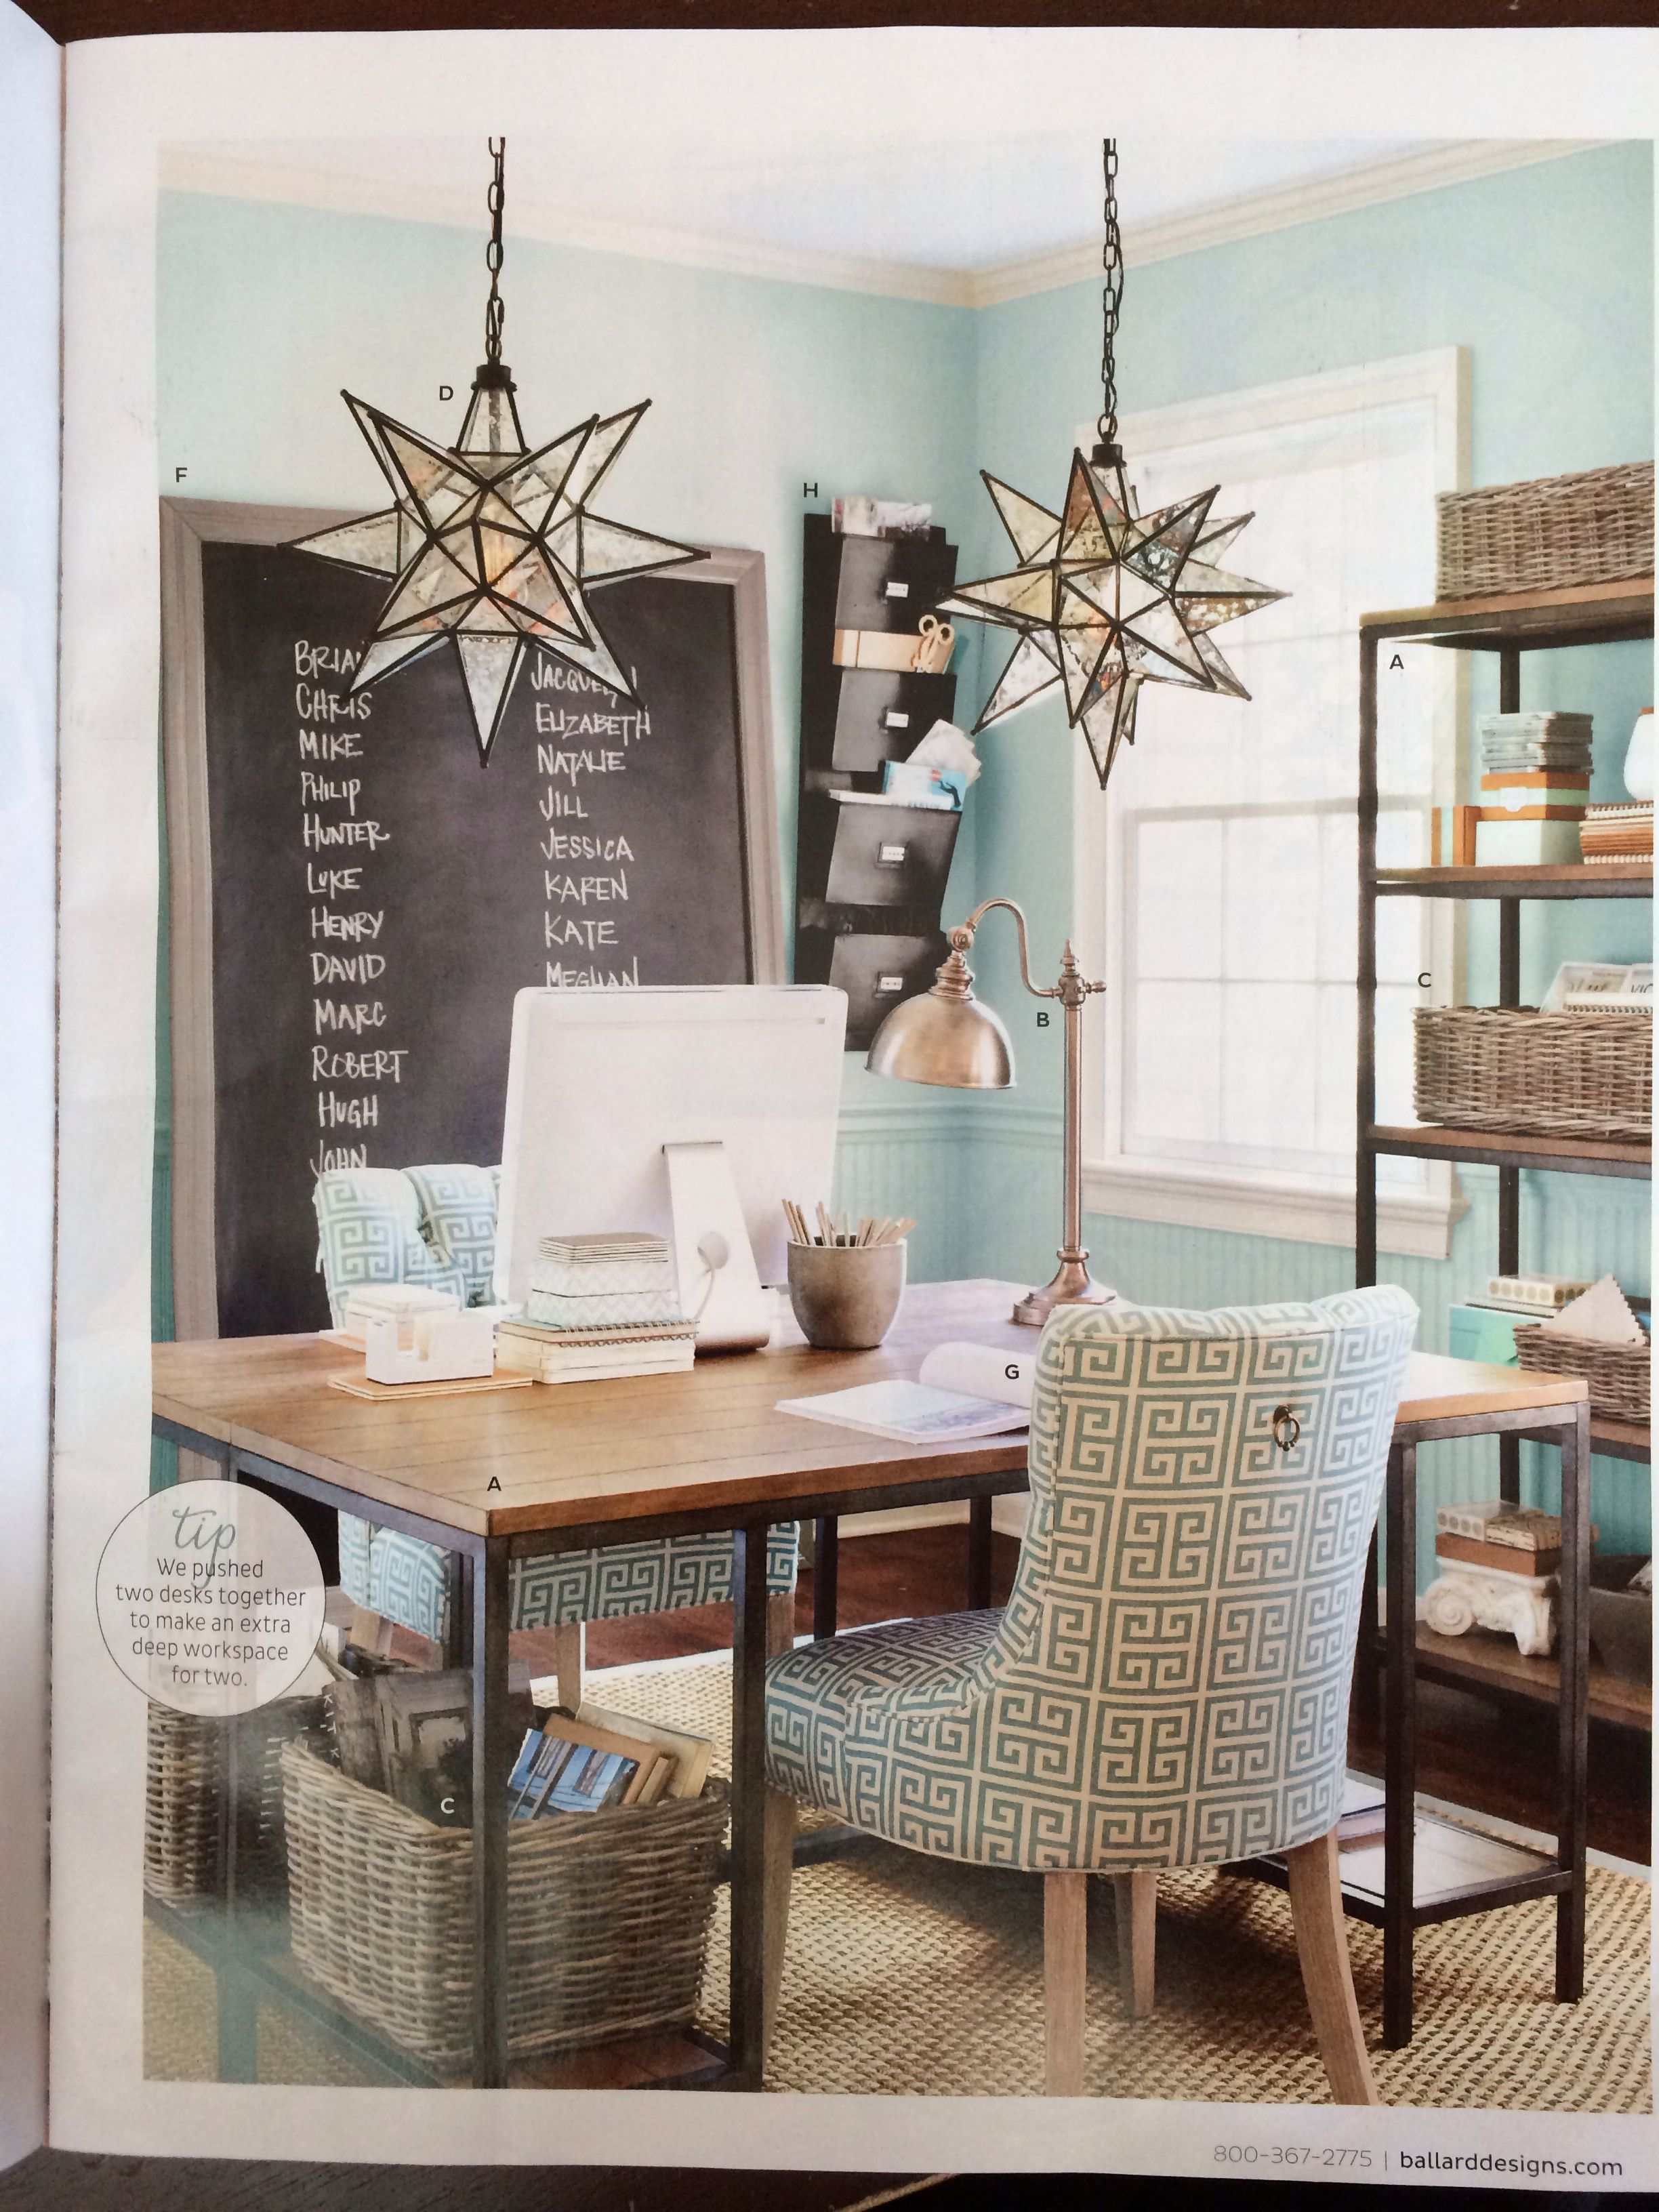 Home Office With Ballard Designs Furnishings Benjamin: Moravian Star Lighting For Entry Way